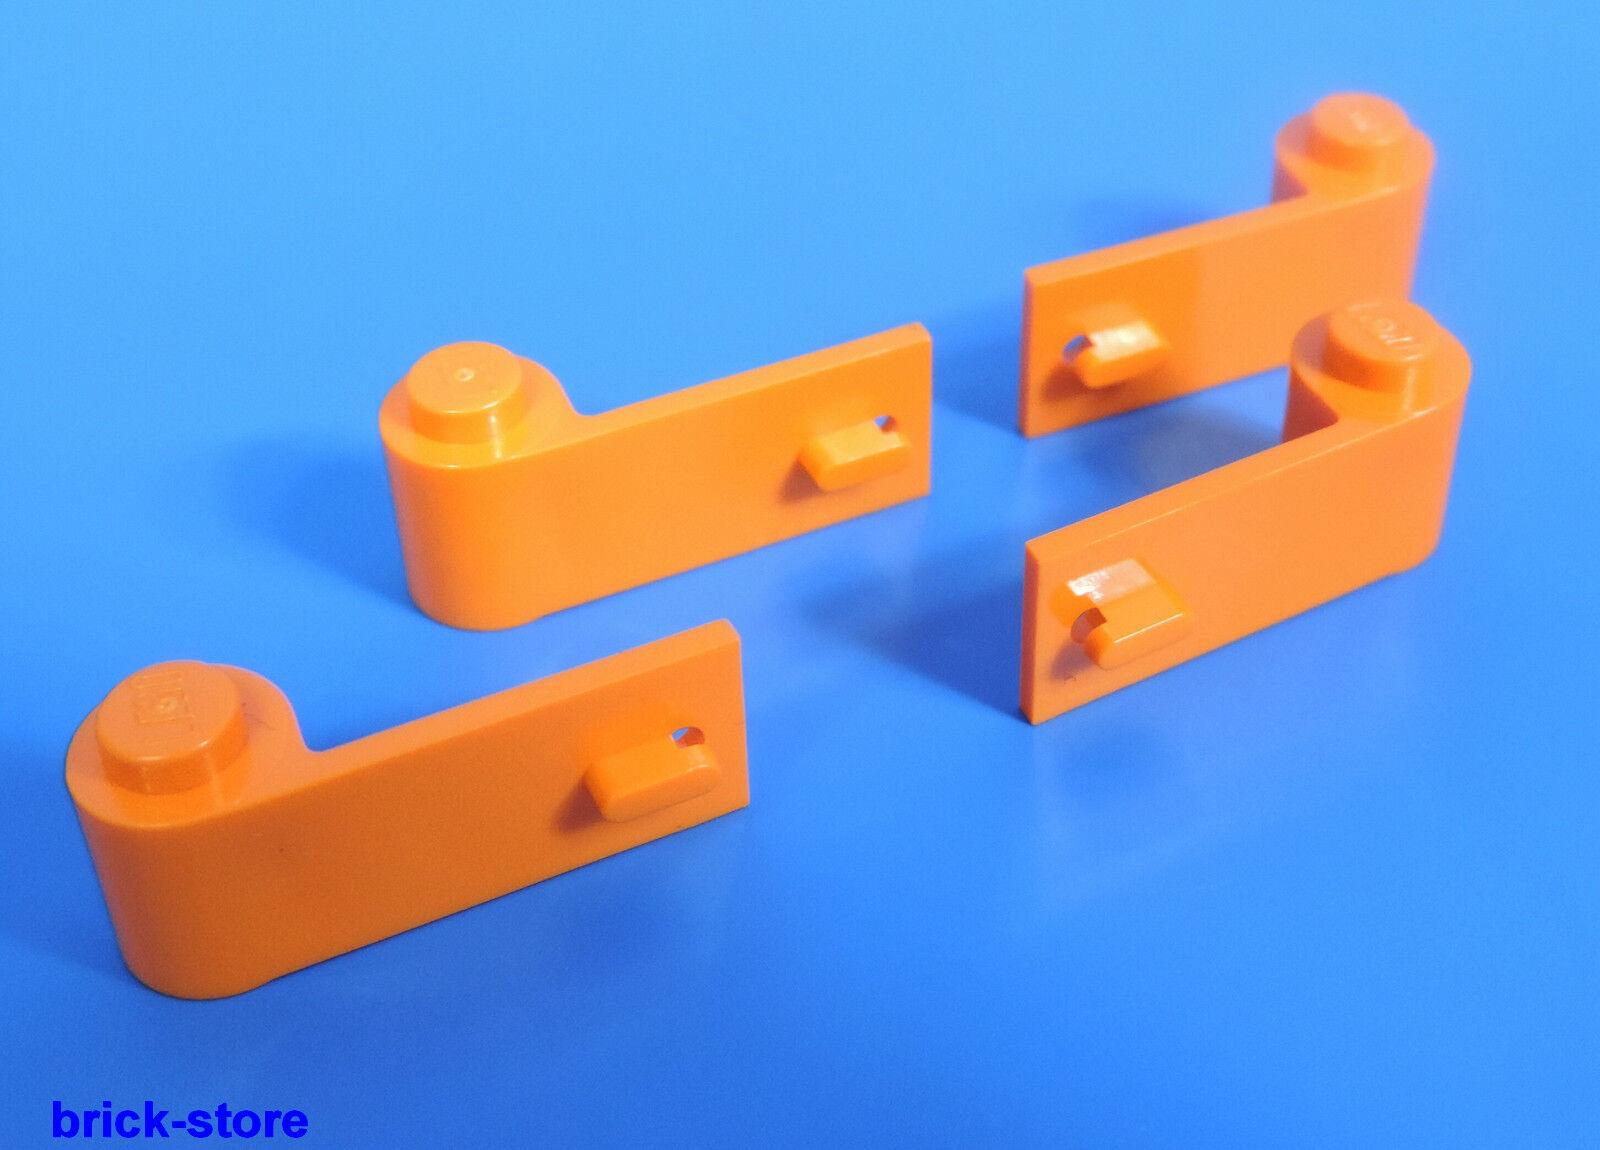 Lego X Nr-4545313/4545315 Porte 1x2x3 Orange 2 X Liens 2 X Lego sur la Droite eb8125